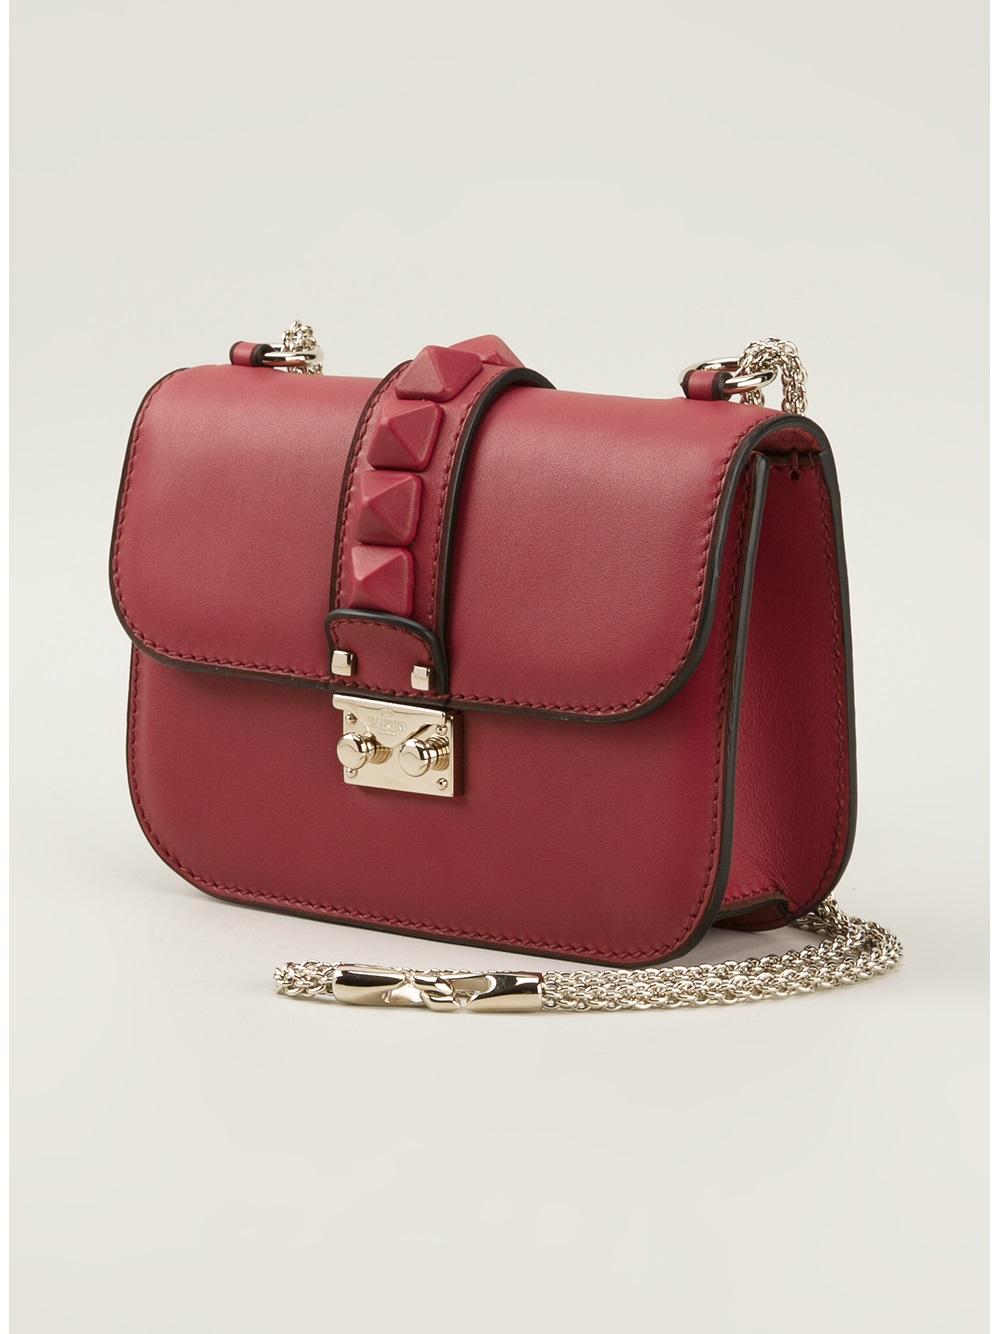 Valentino Handbags and Purses - PurseBlog